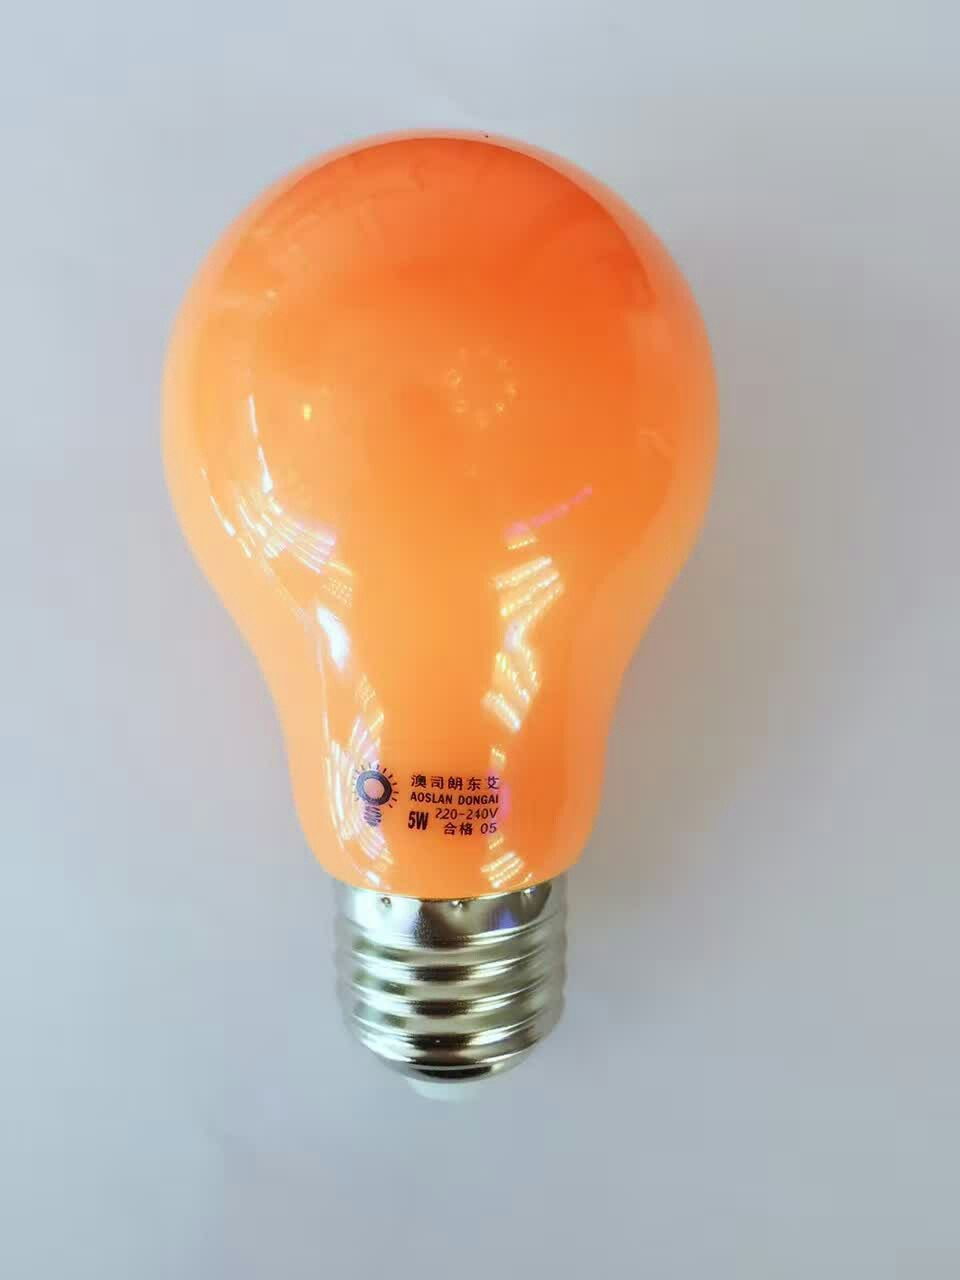 A60 led灯泡 红色球泡 各种颜色led蜡烛灯泡